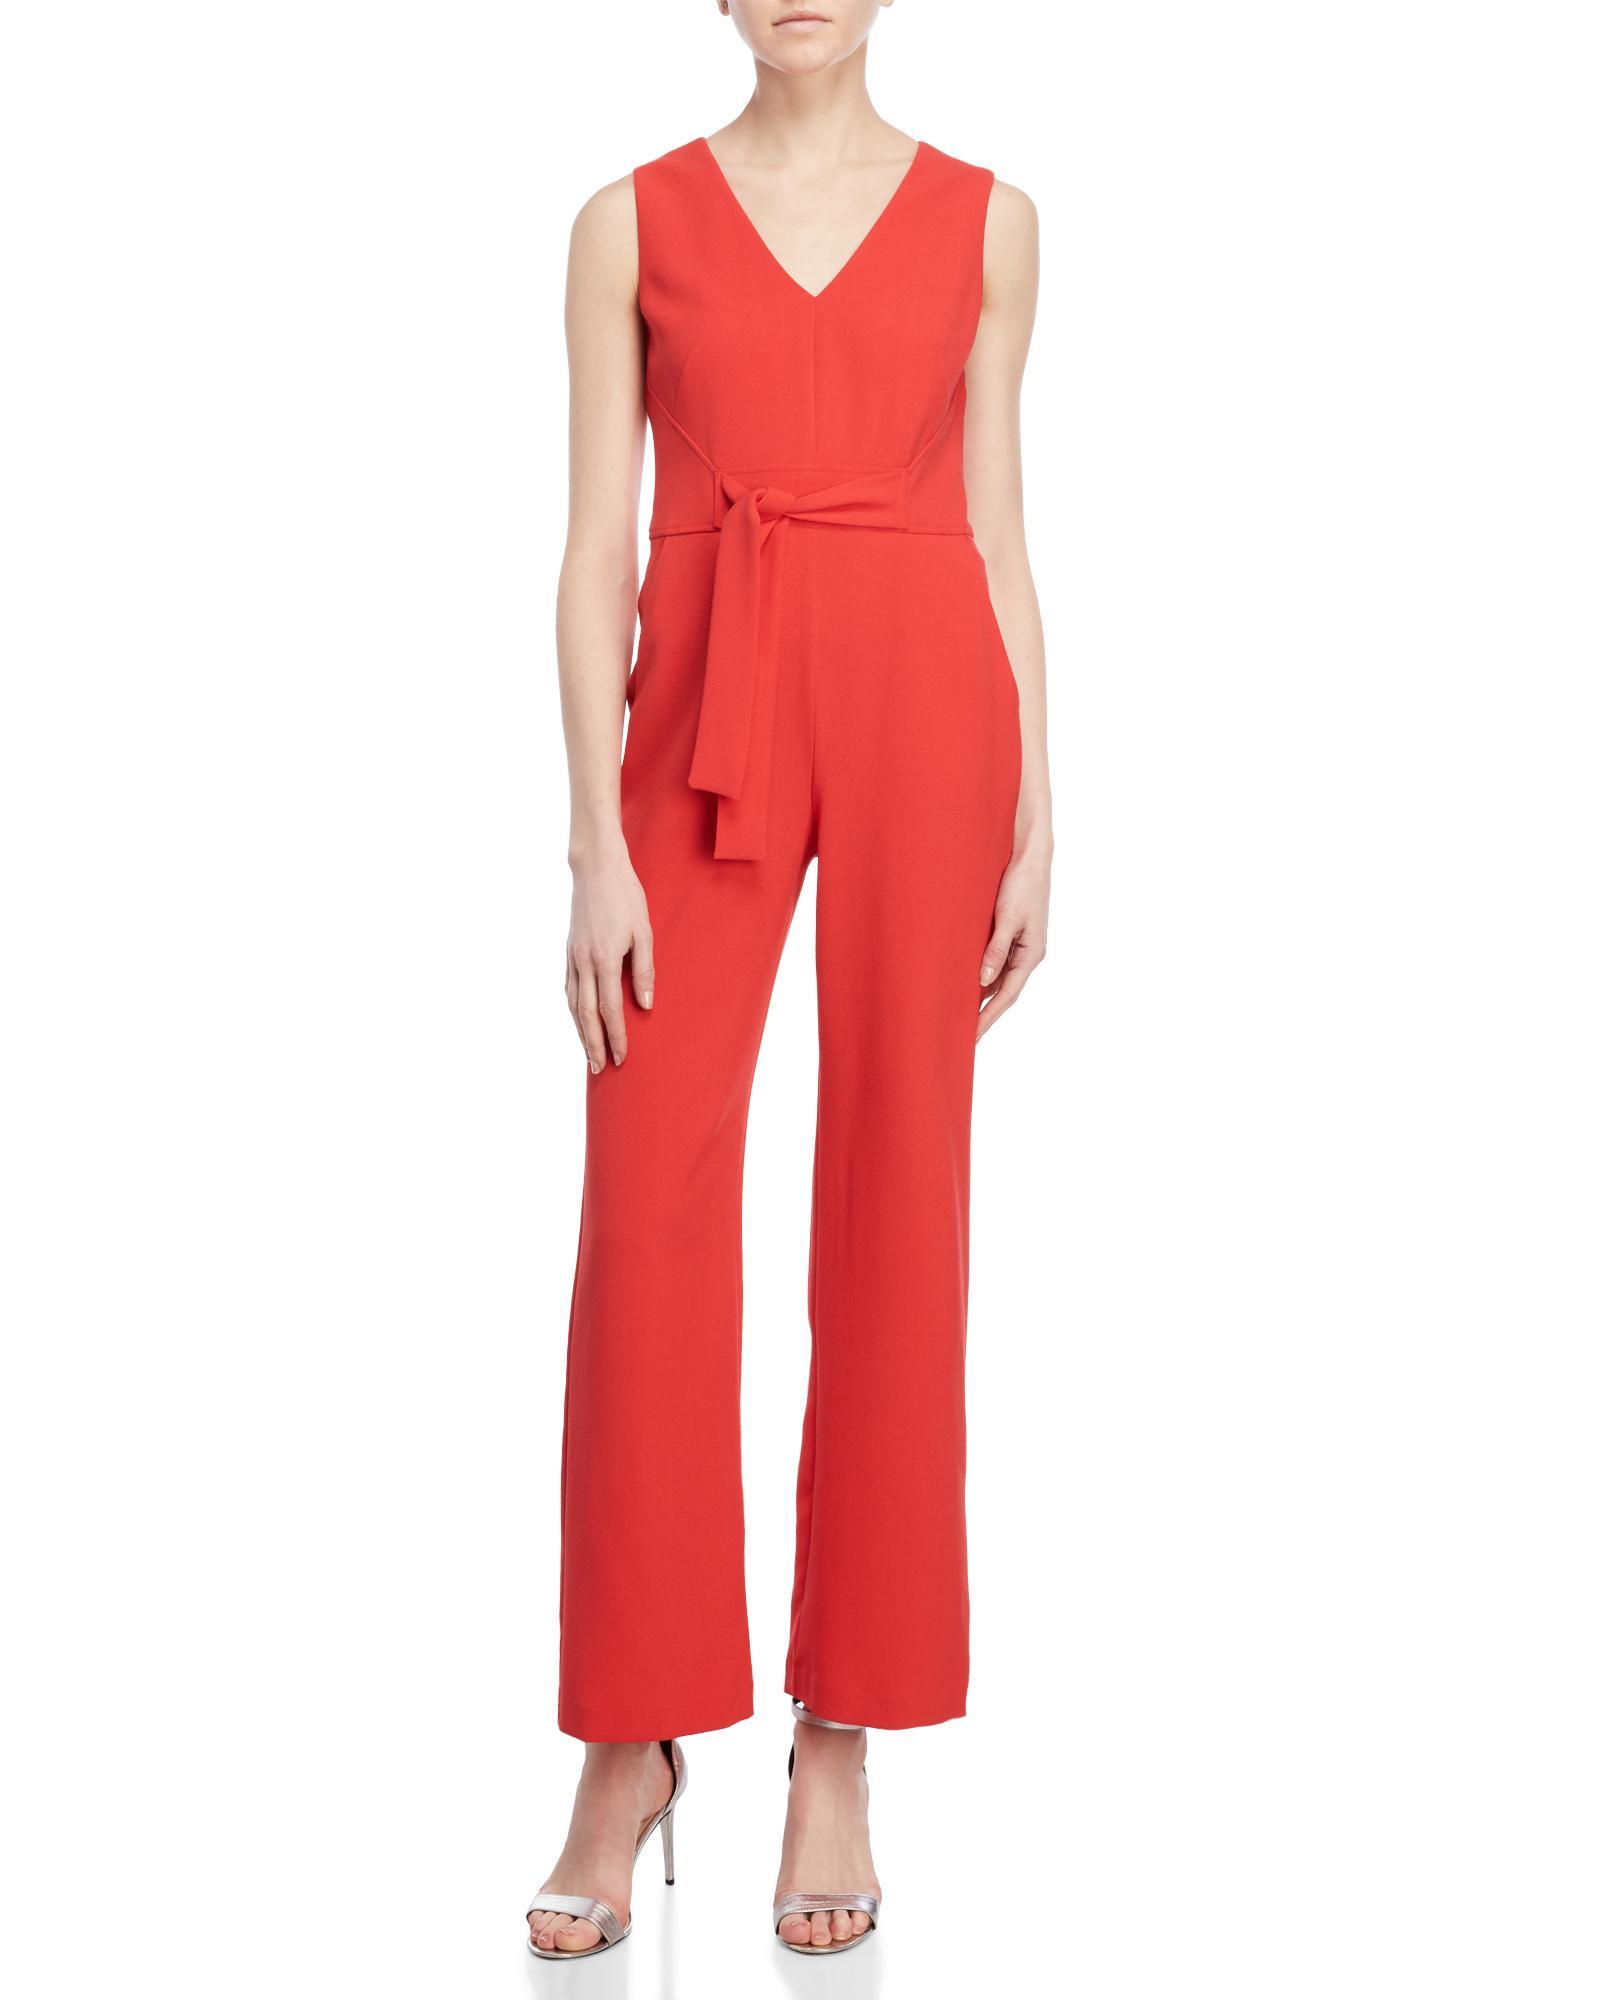 c6da0063d16 Lyst - Vince Camuto Petite Crepe Tie Waist Jumpsuit in Red